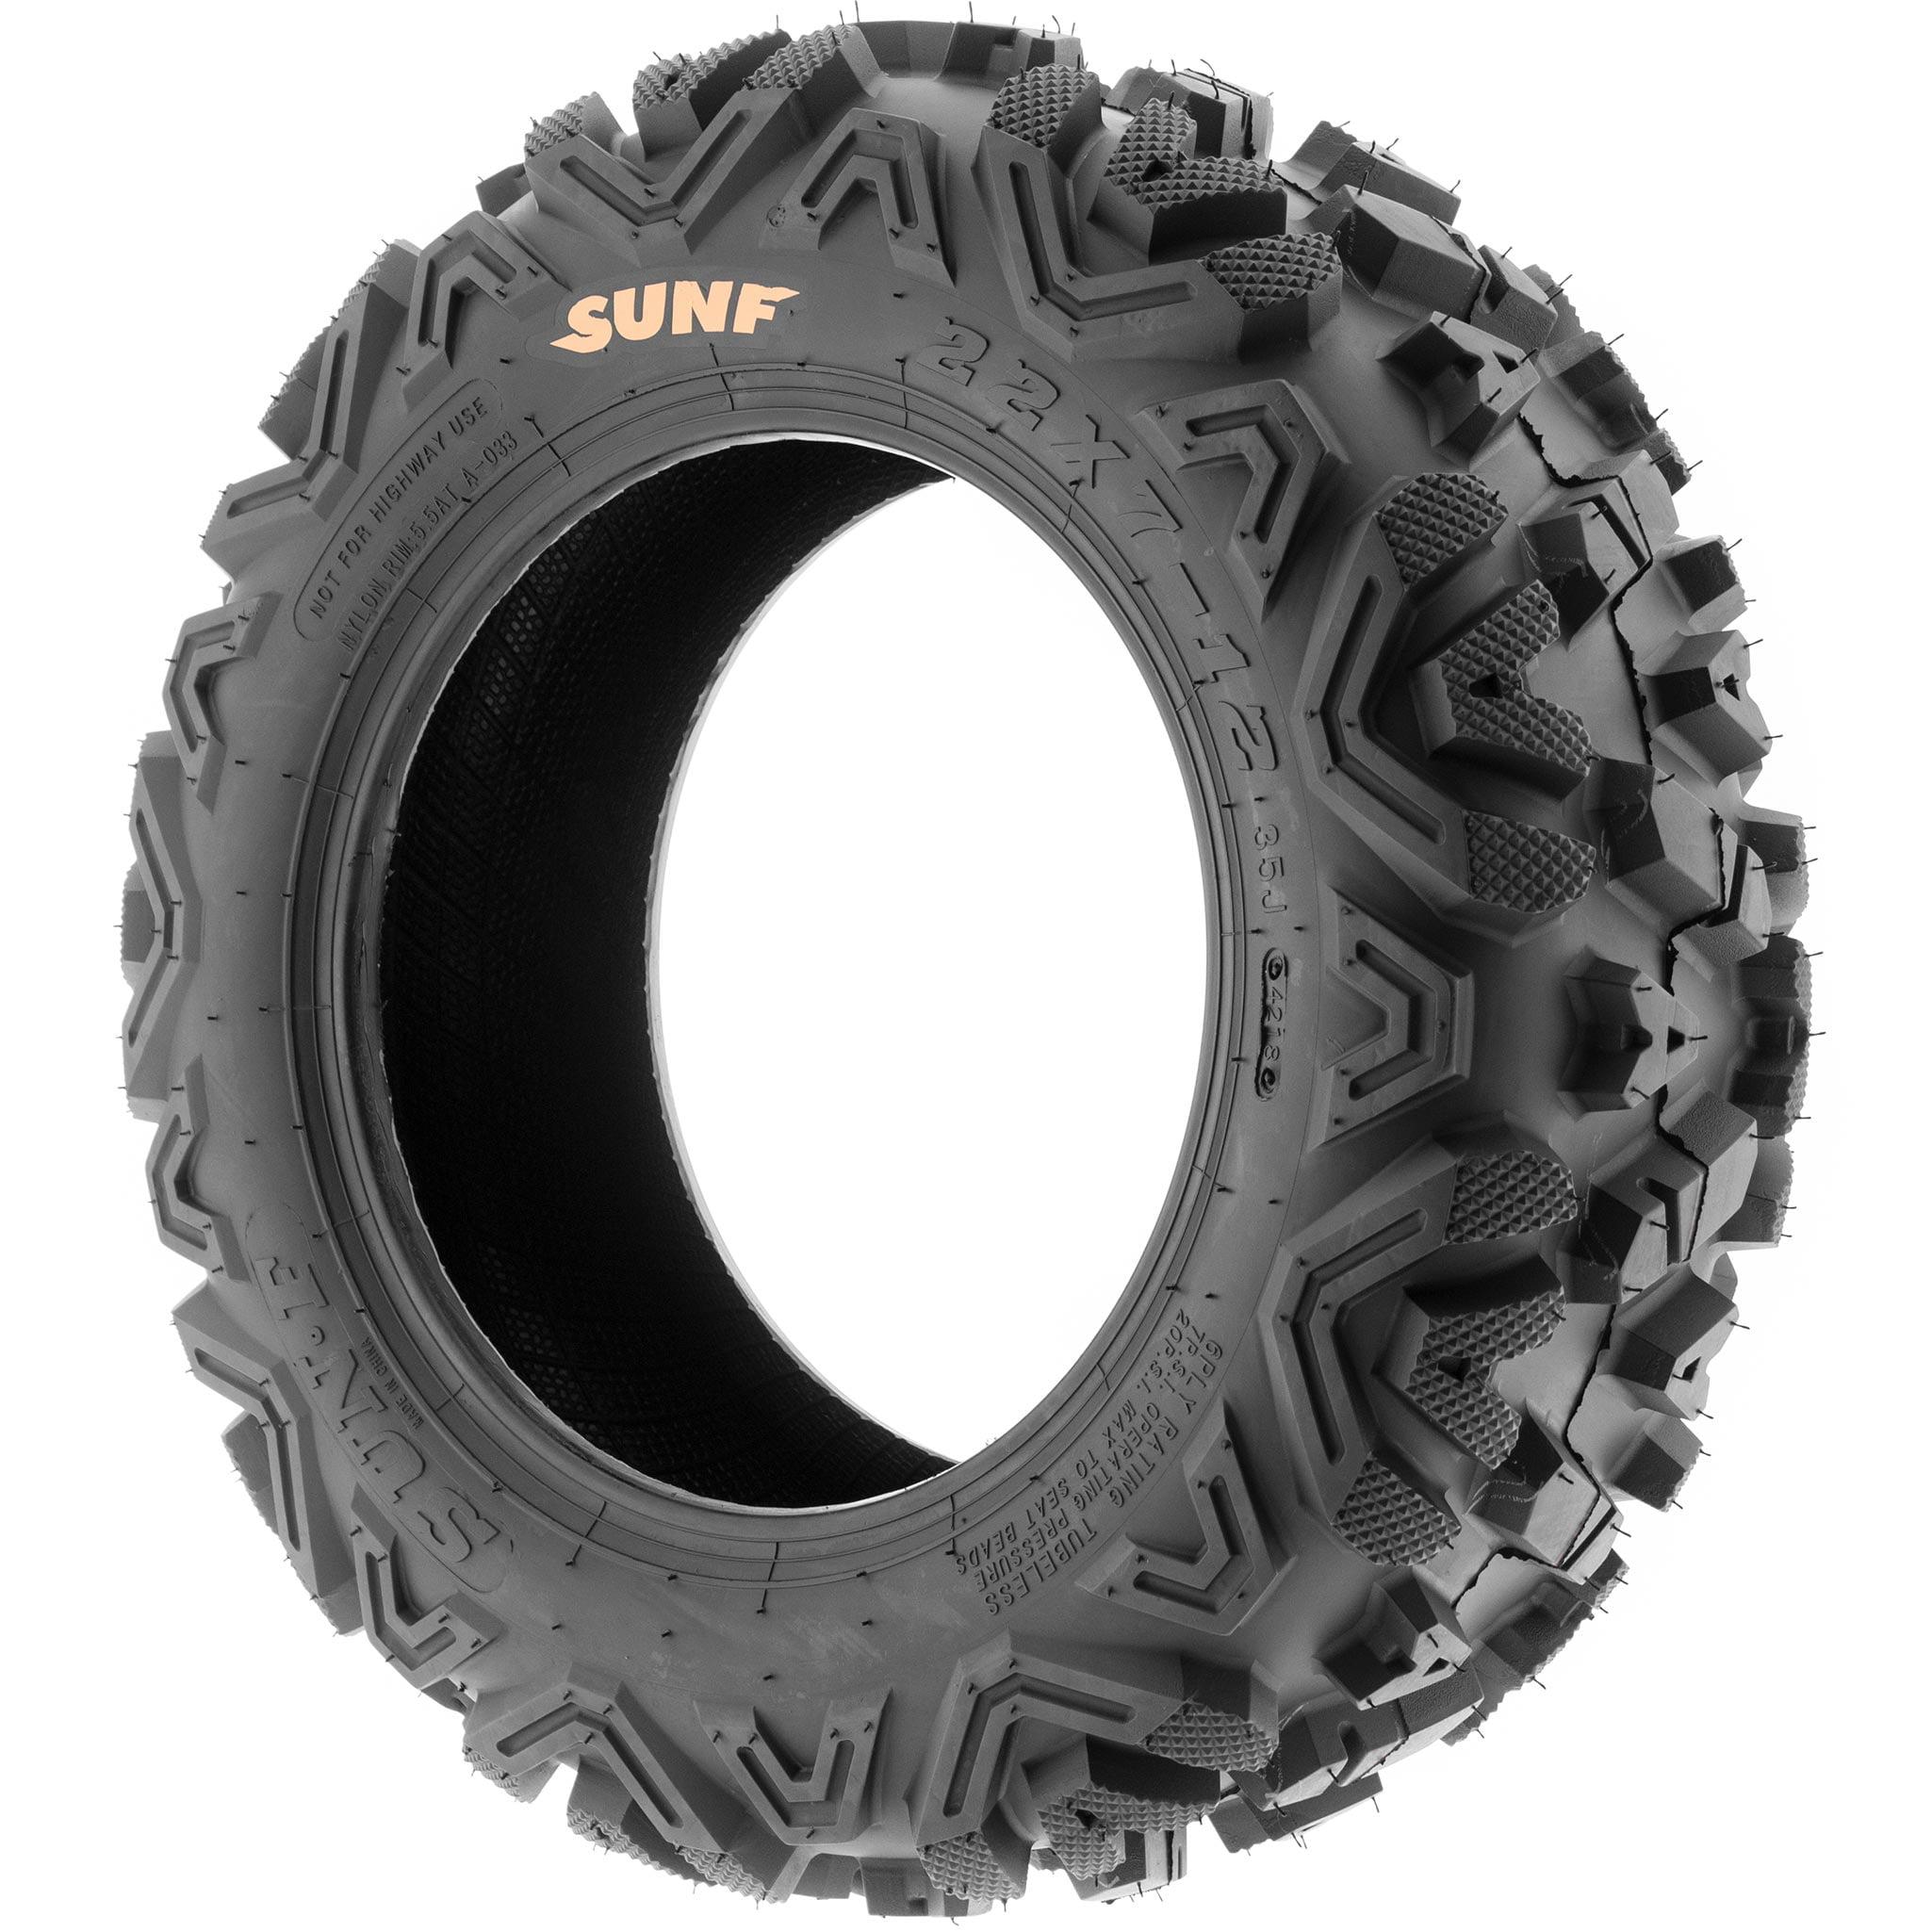 Set of 4 SunF Power.I ATV//UTV AT All-Terrain Tire Bundle 24x8-11 Front /& 24x11-10 Rear 6 PR Tubeless A033